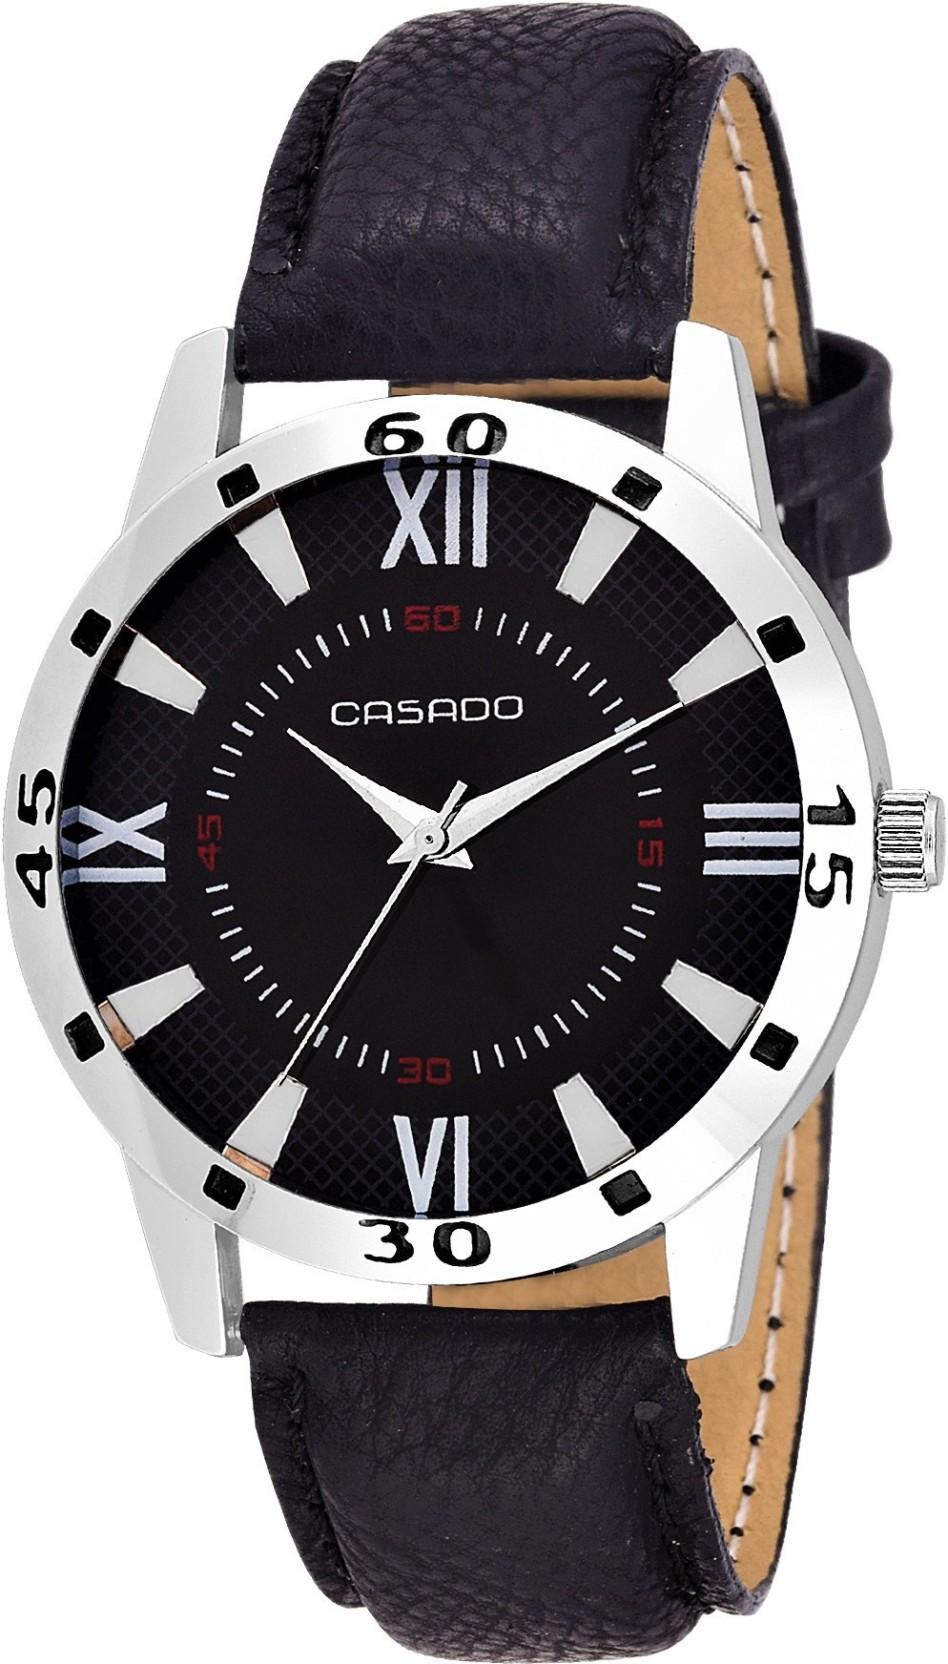 Casado 195 Time Watch - For Boys